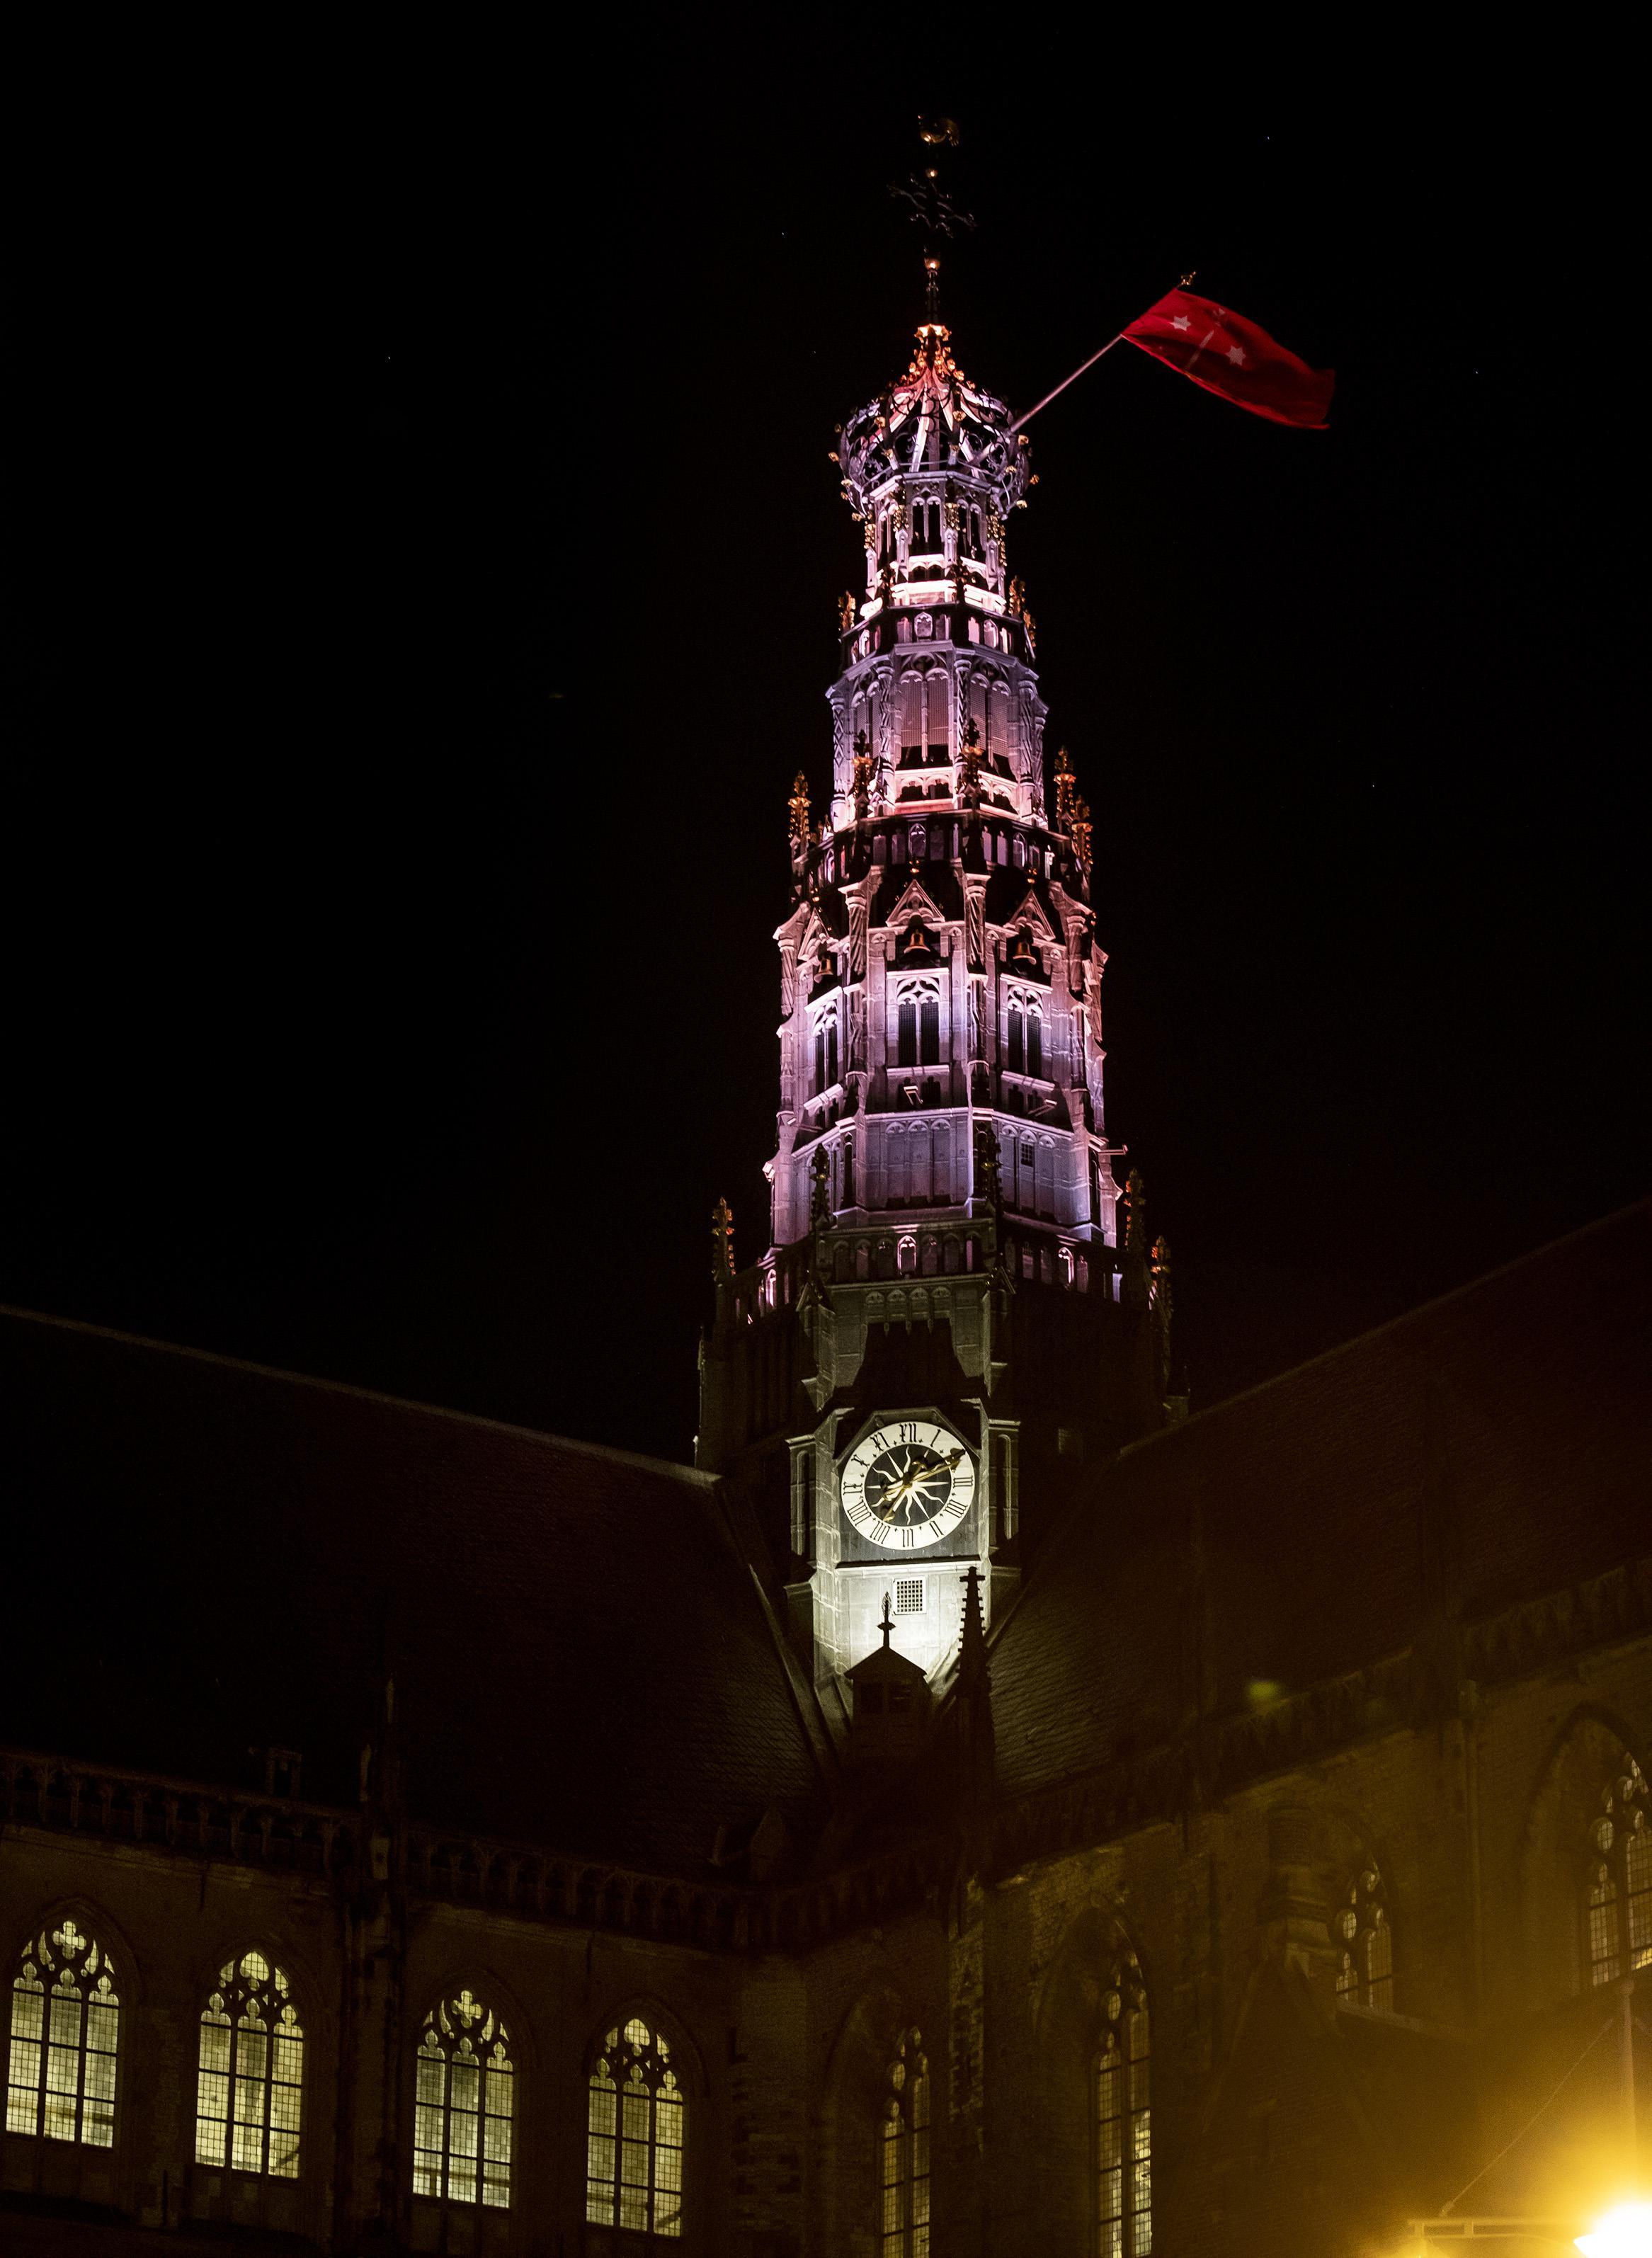 Haarlem 775: Nieuw Haarlem-lied klinkt rond verlichte Bavo-toren tijdens afsluitende 'Toost'[video]